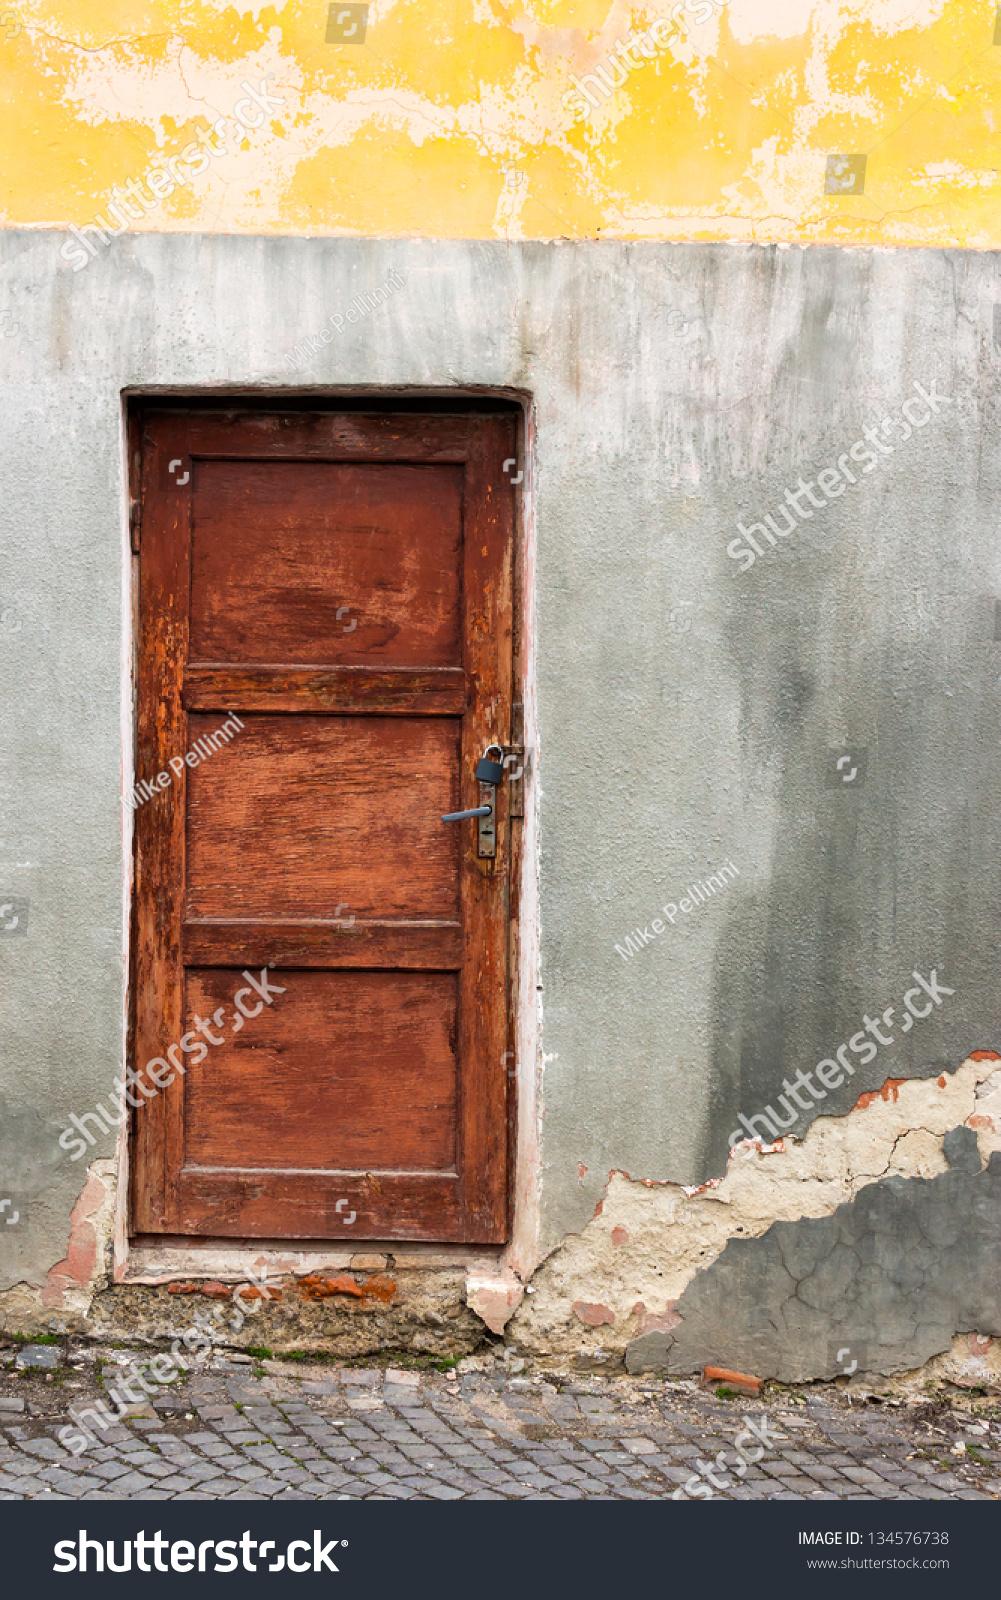 how to fix a cracked wooden door frame